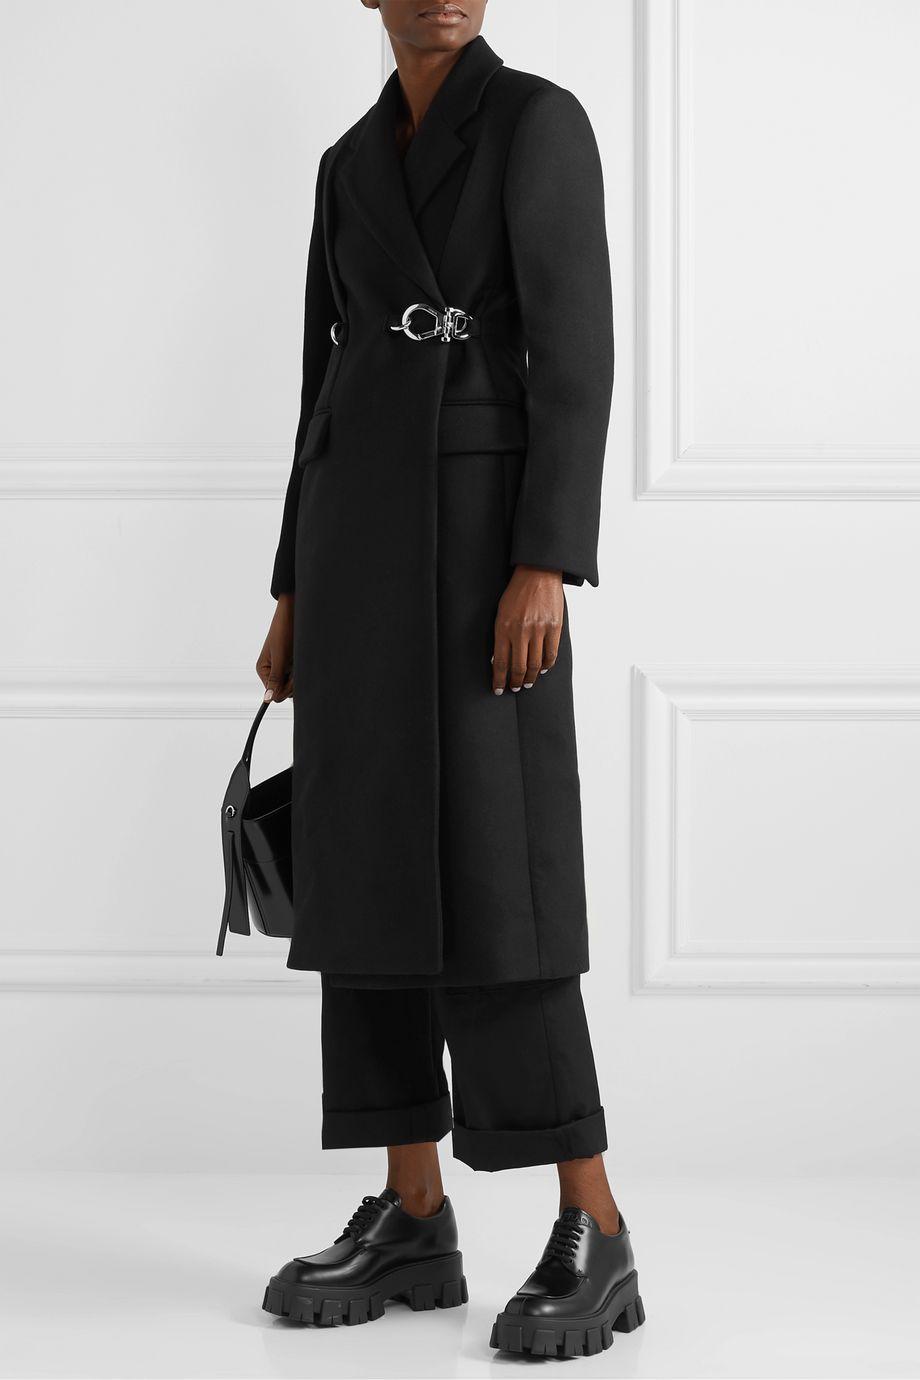 Prada Belted wool coat